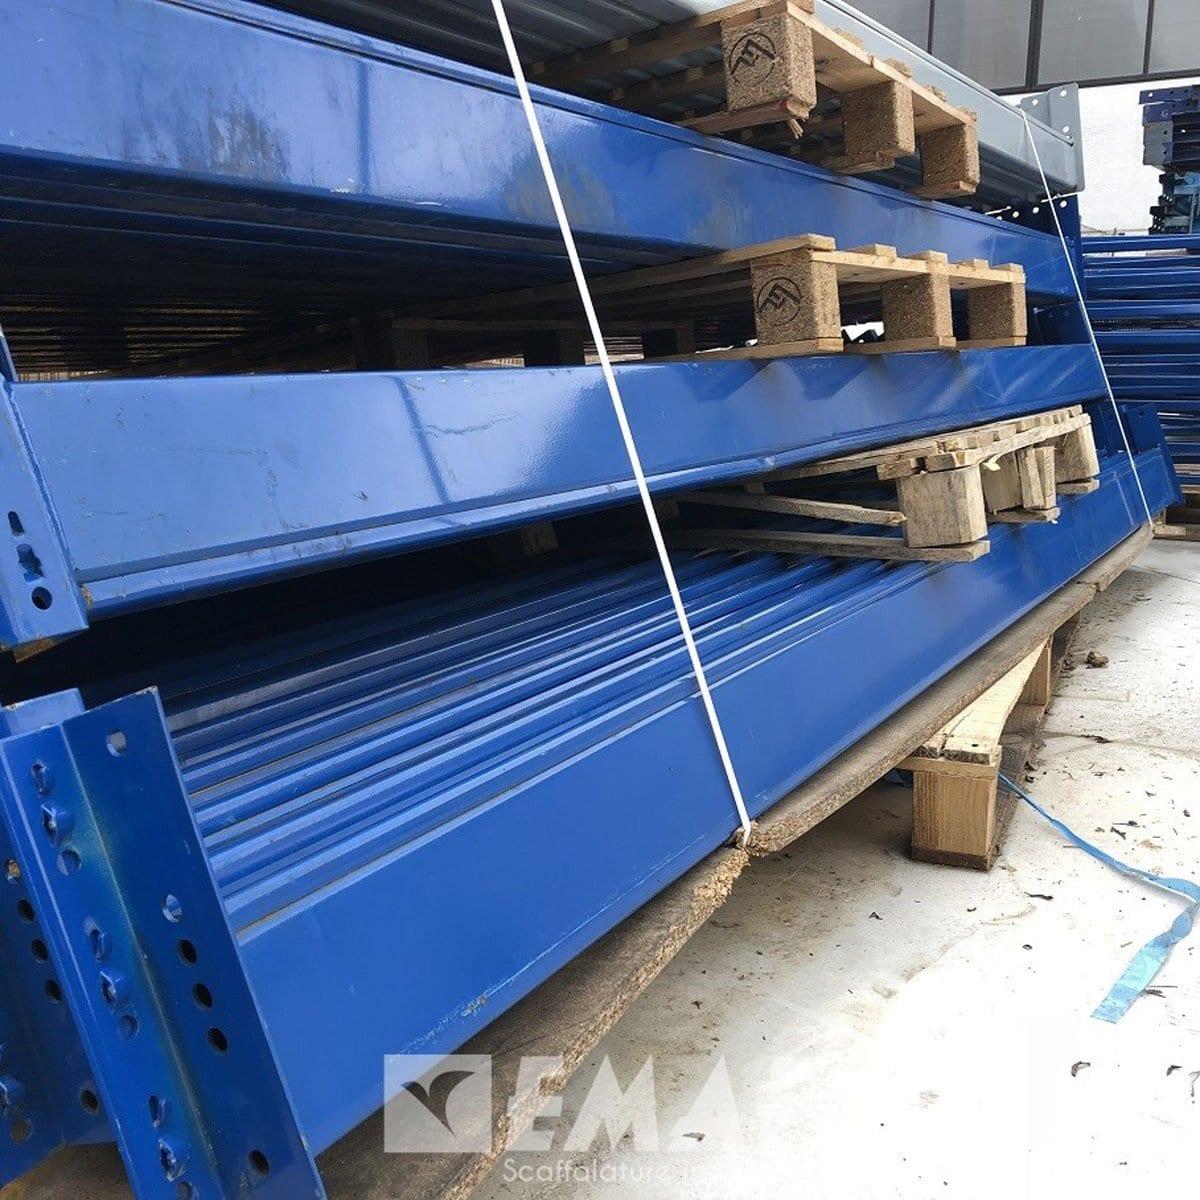 Scaffalature Metalliche Industriali Prezzi.Portapallet Usato Scaffalatura Industriale Usata Da 72 Bancali